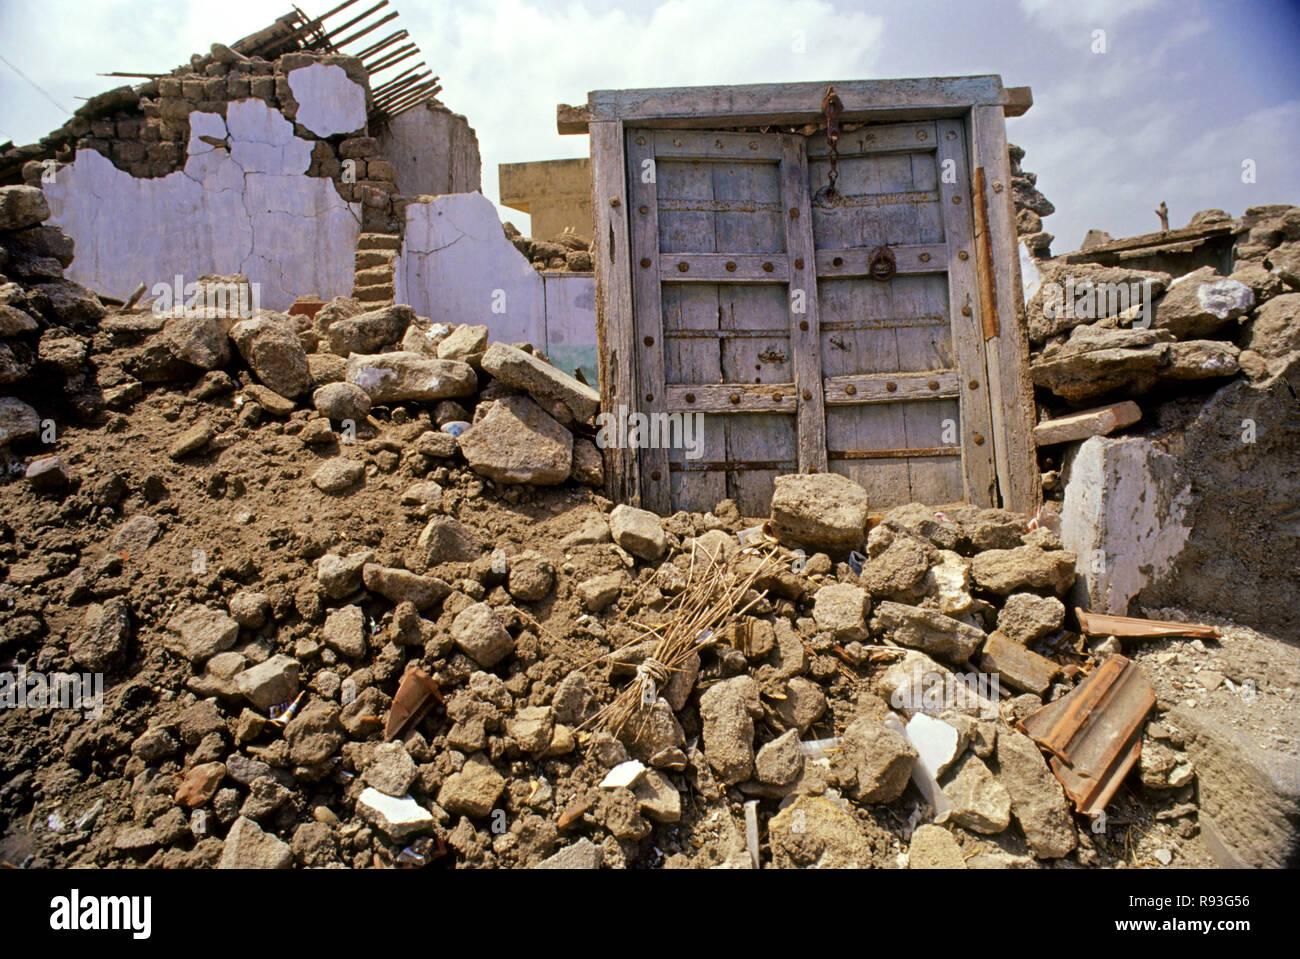 Earthquakes -26 TH Jan 2001, Bhuj, Gujarat, India - Stock Image